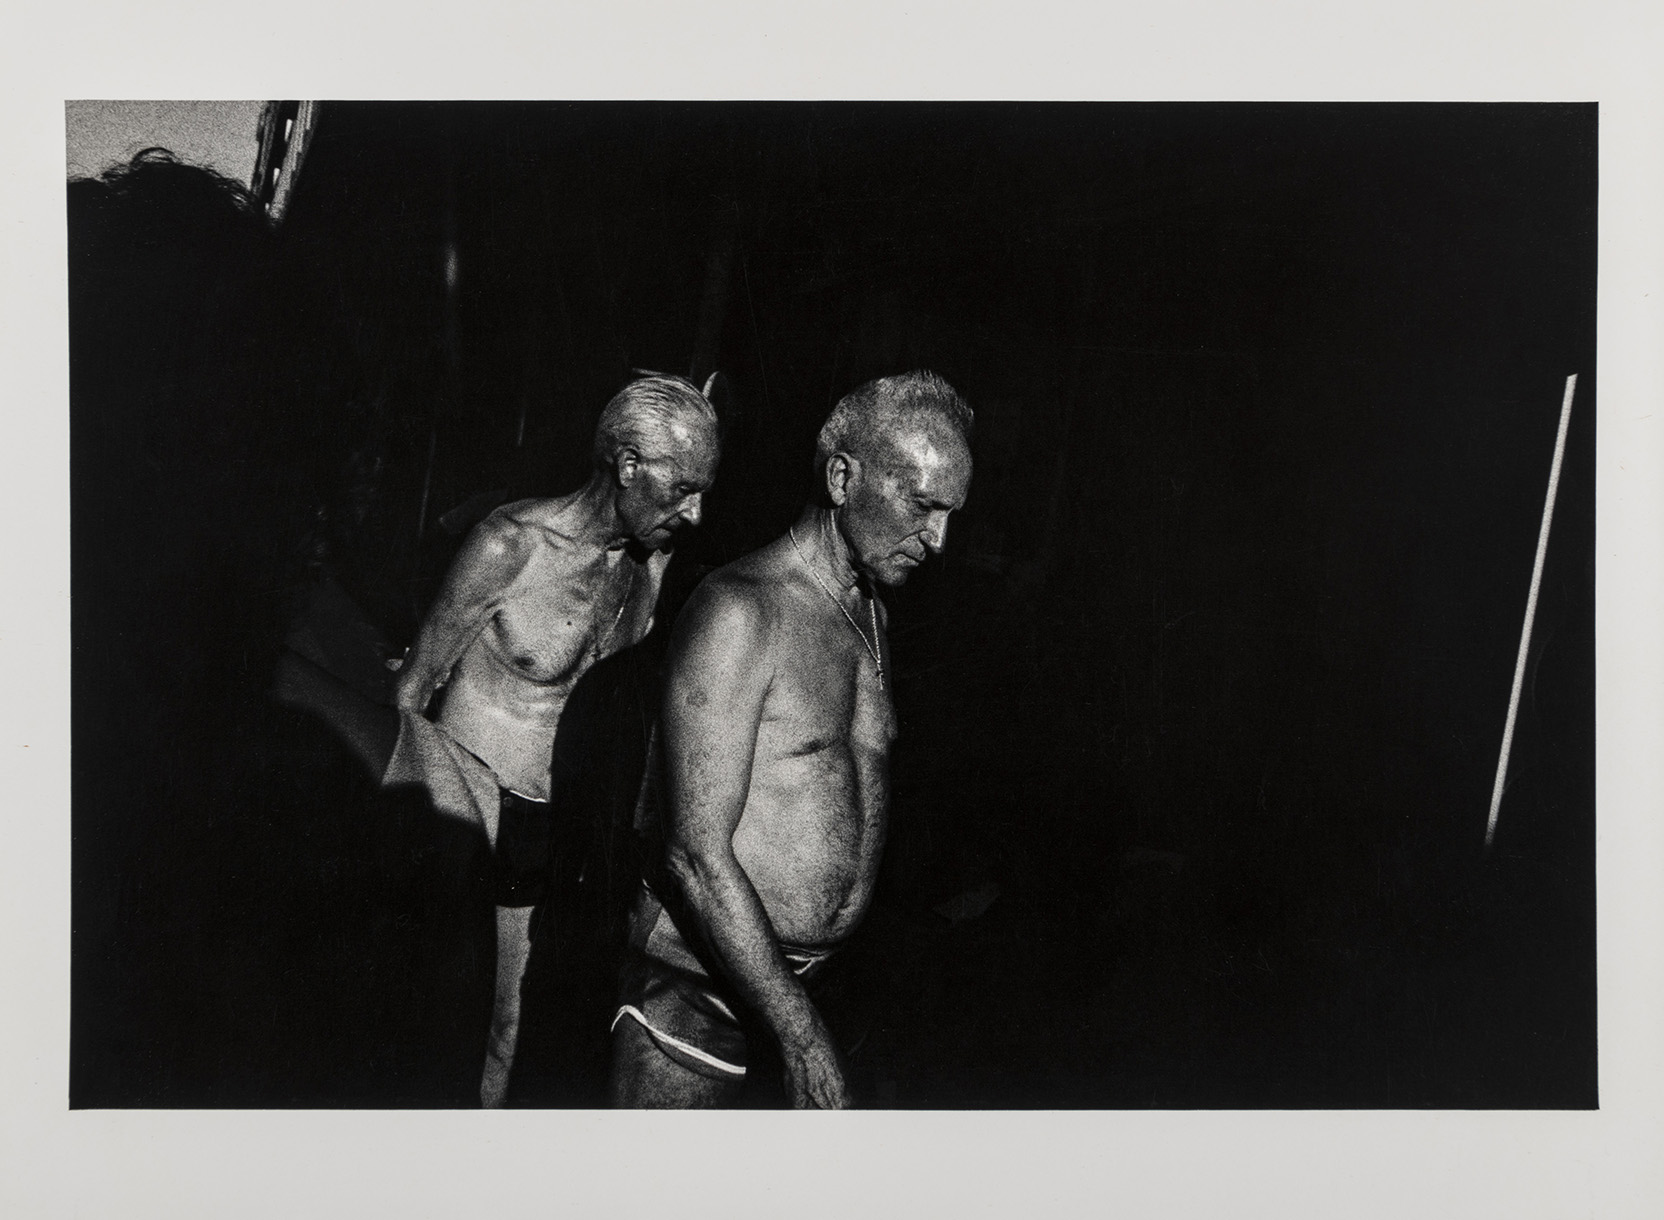 Paulo Nozolino. Cullera, 1985 (L'Albufera. Visió tangencial). IVAM, Institut Valencià d'Art Modern, Generalitat © Paulo Nozolino